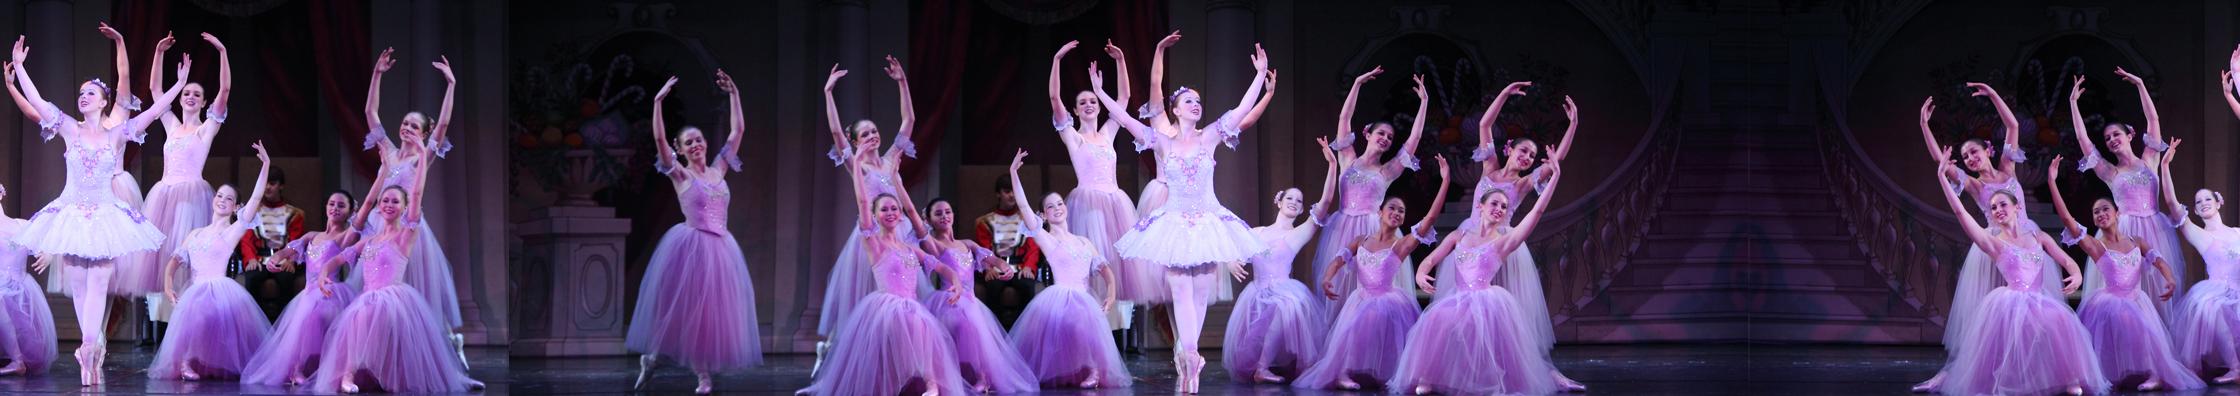 State street Arlington Theatre Nutcracker Santa Barbara Festival Ballet Tradition24